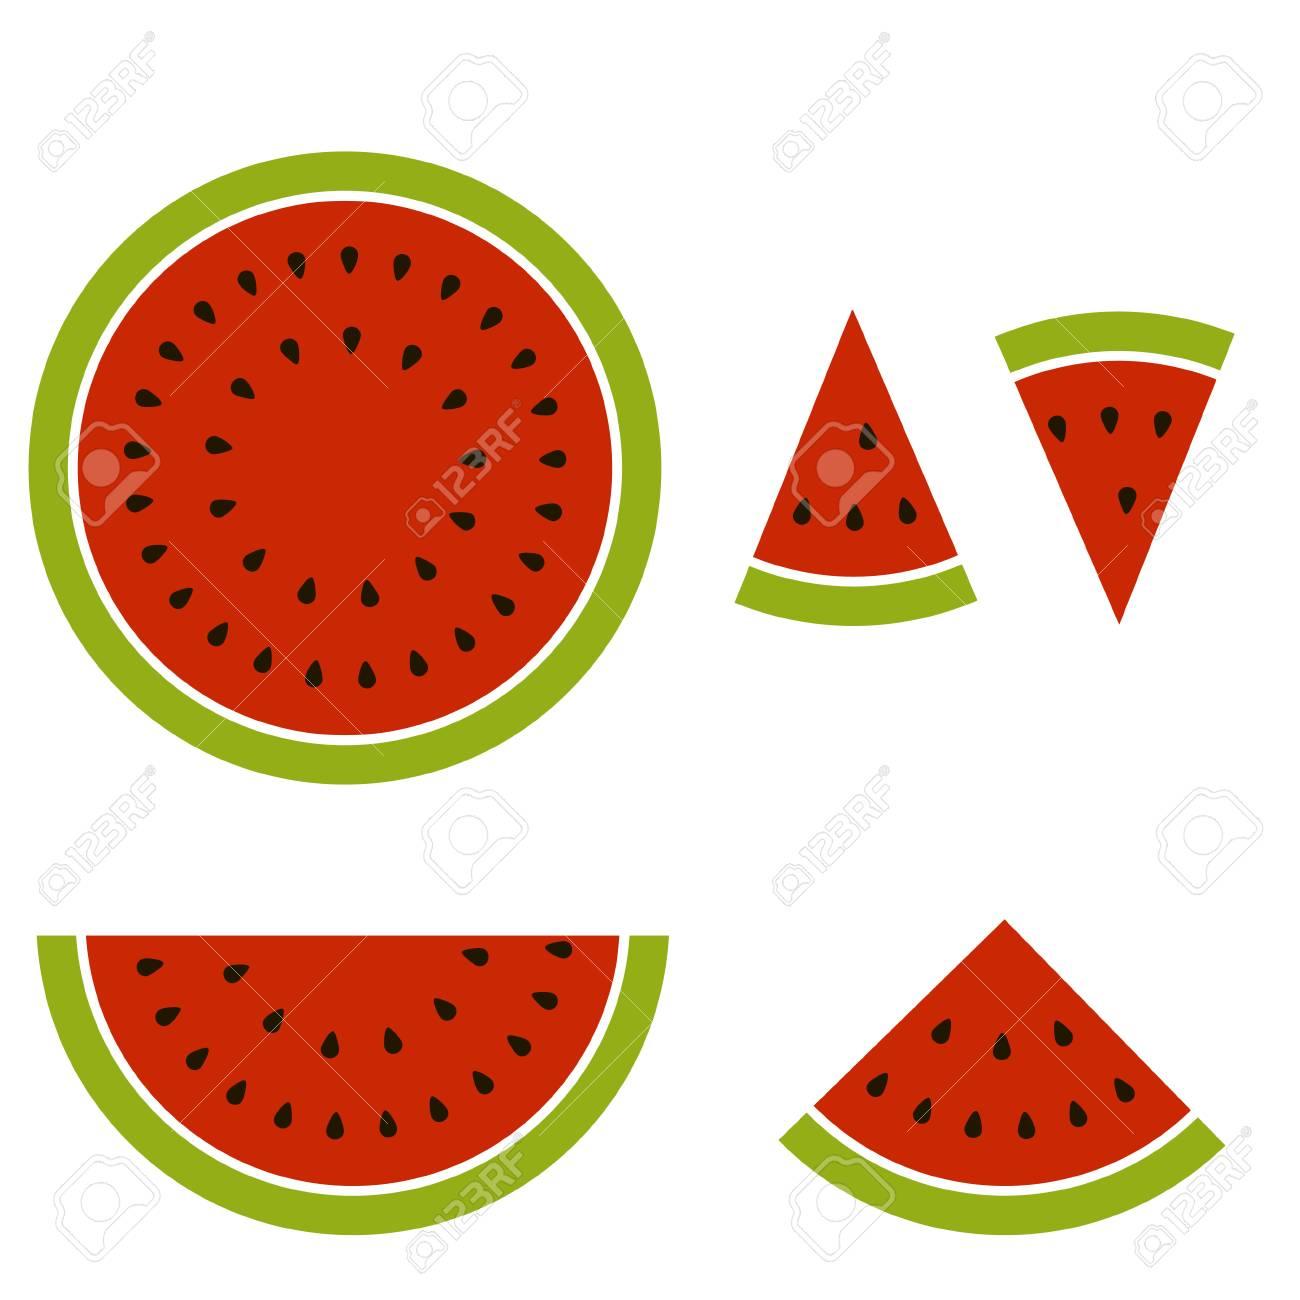 cartoon image split into pieces watermelon vector illustration rh 123rf com watermelon vectorial watermelon vector cute